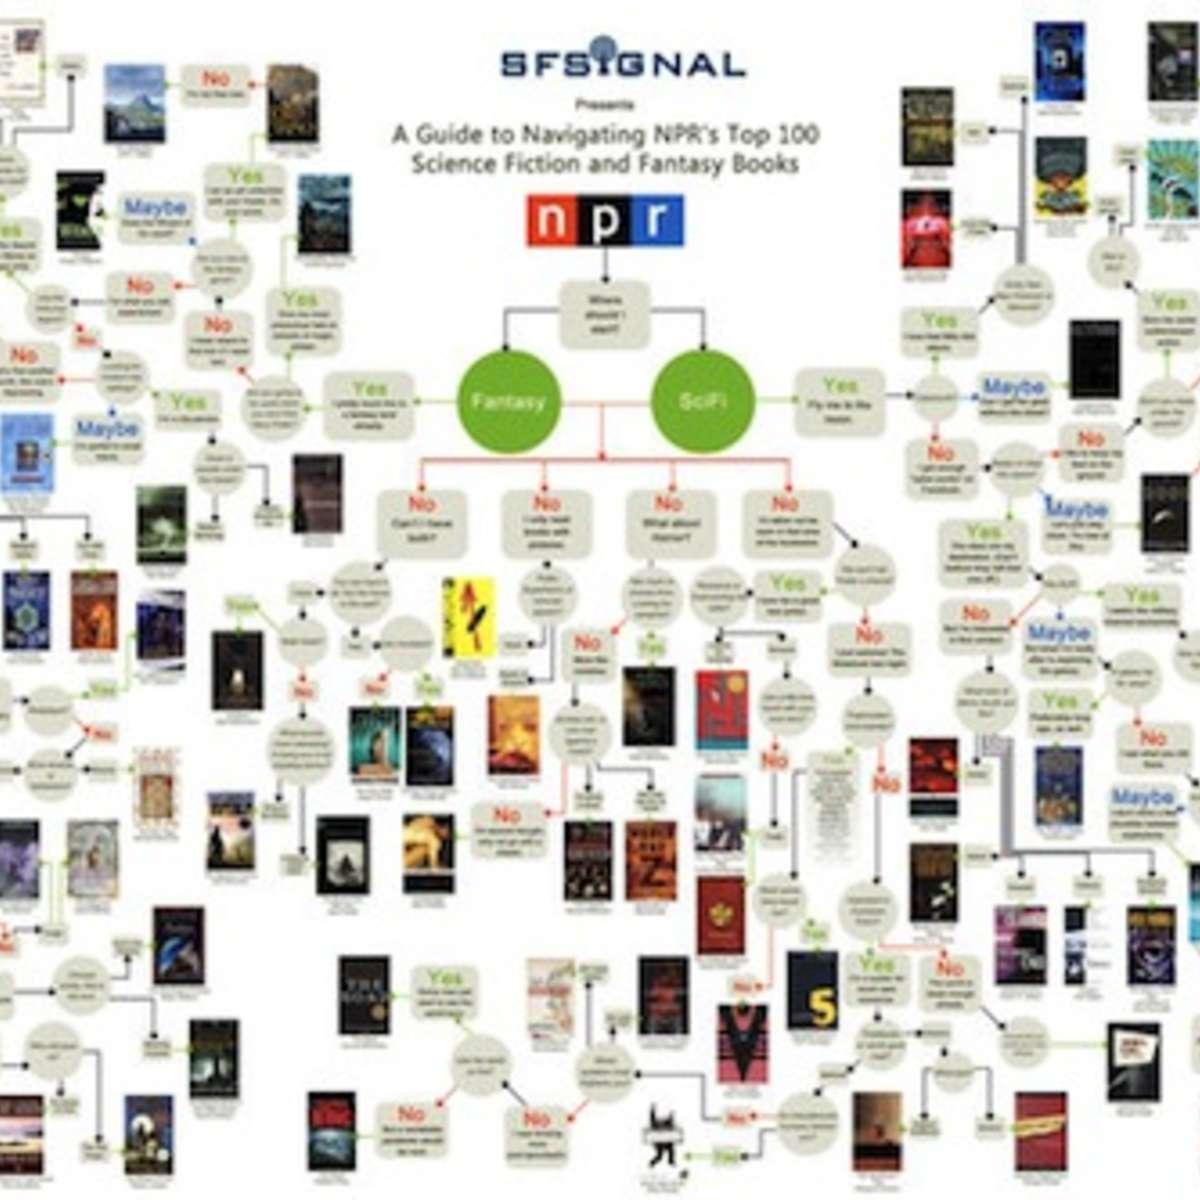 NPRTop100BooksInfographic.jpeg